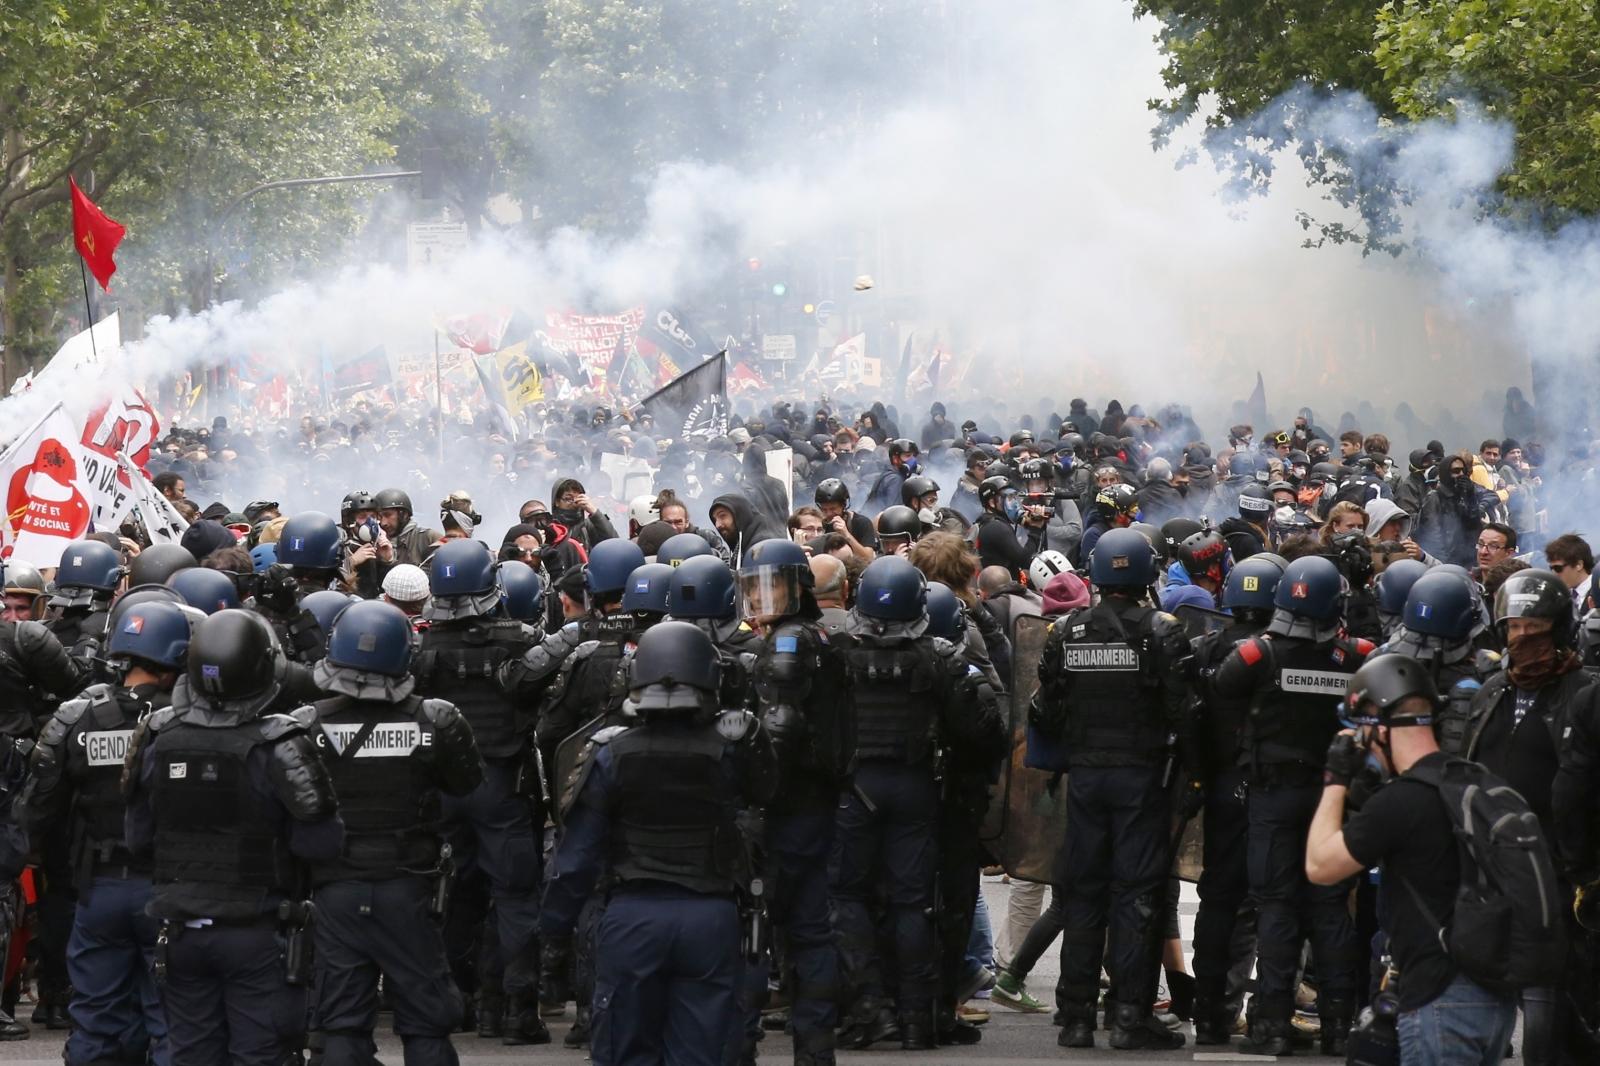 Tear gas floats